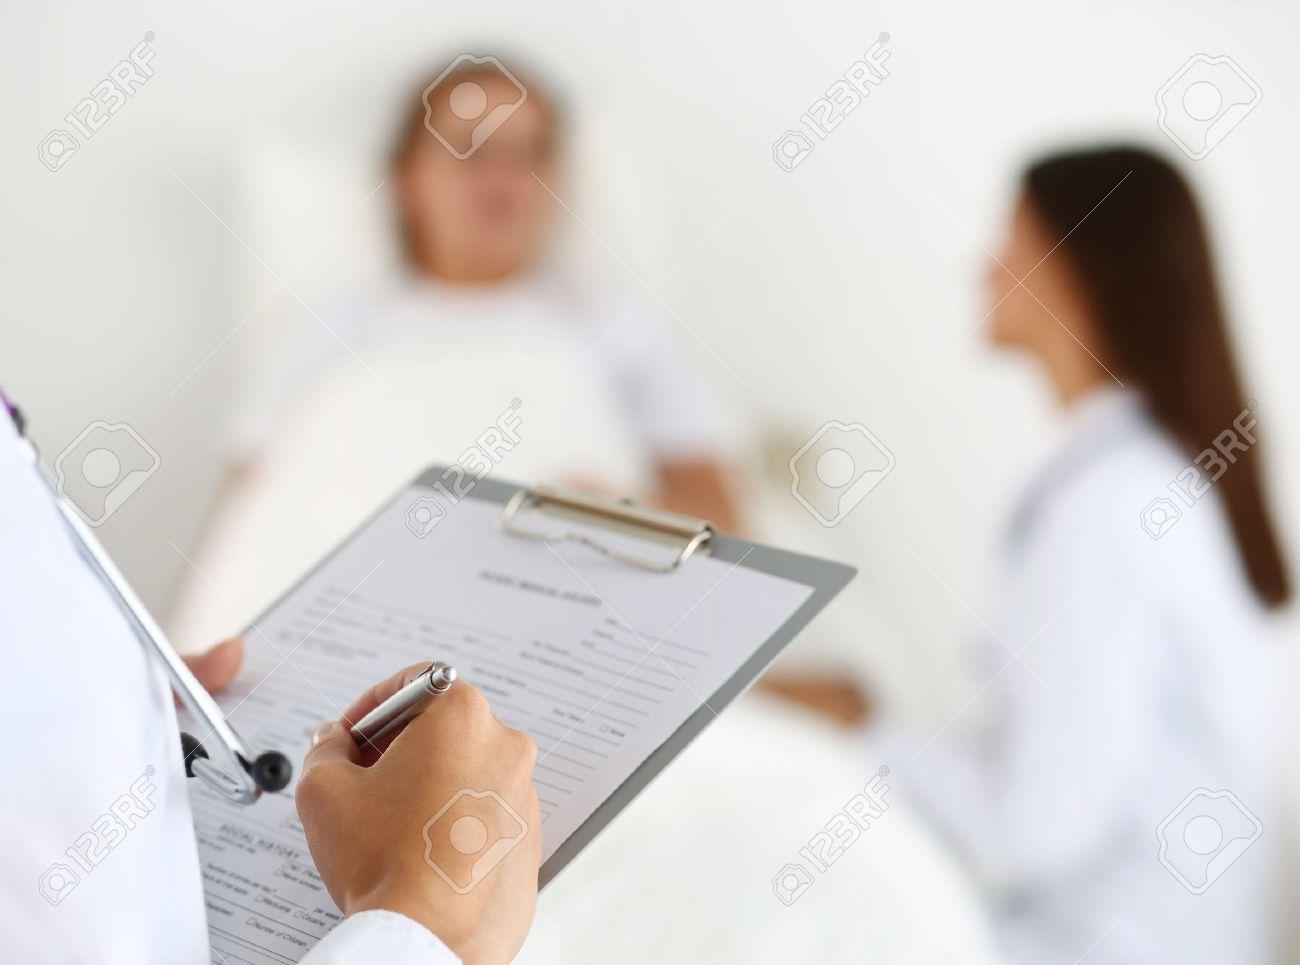 Female Medicine Doctor Filling In Patient Medical History